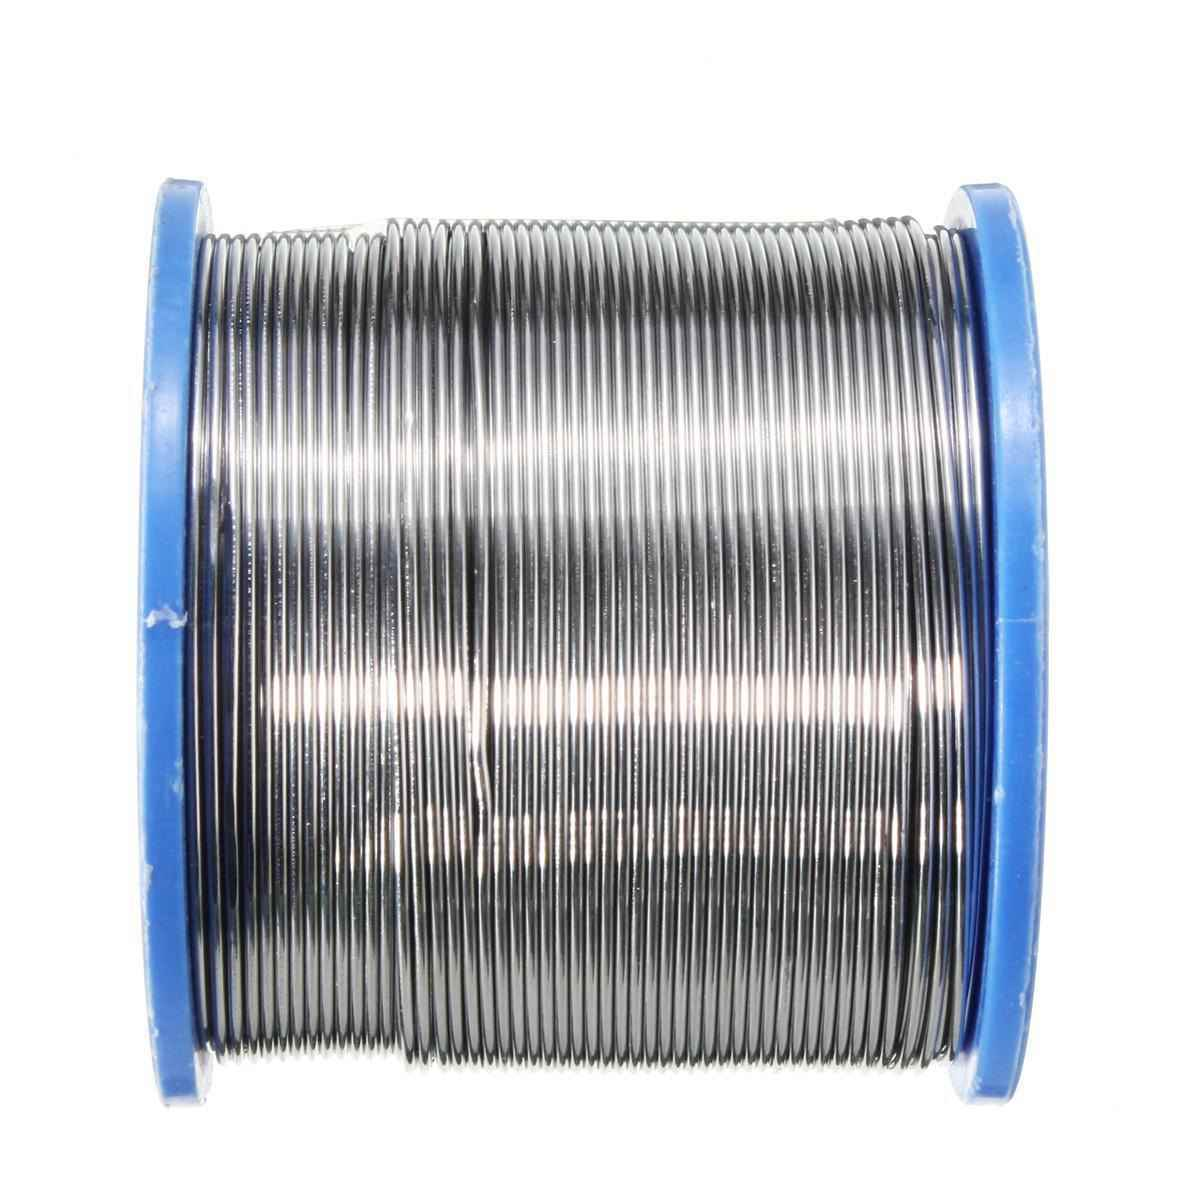 0.5/0.7/1mm 60/40 fluxo 2.0% 500g estanho chumbo solda fio fusão rosin núcleo solda fio de solda rolo